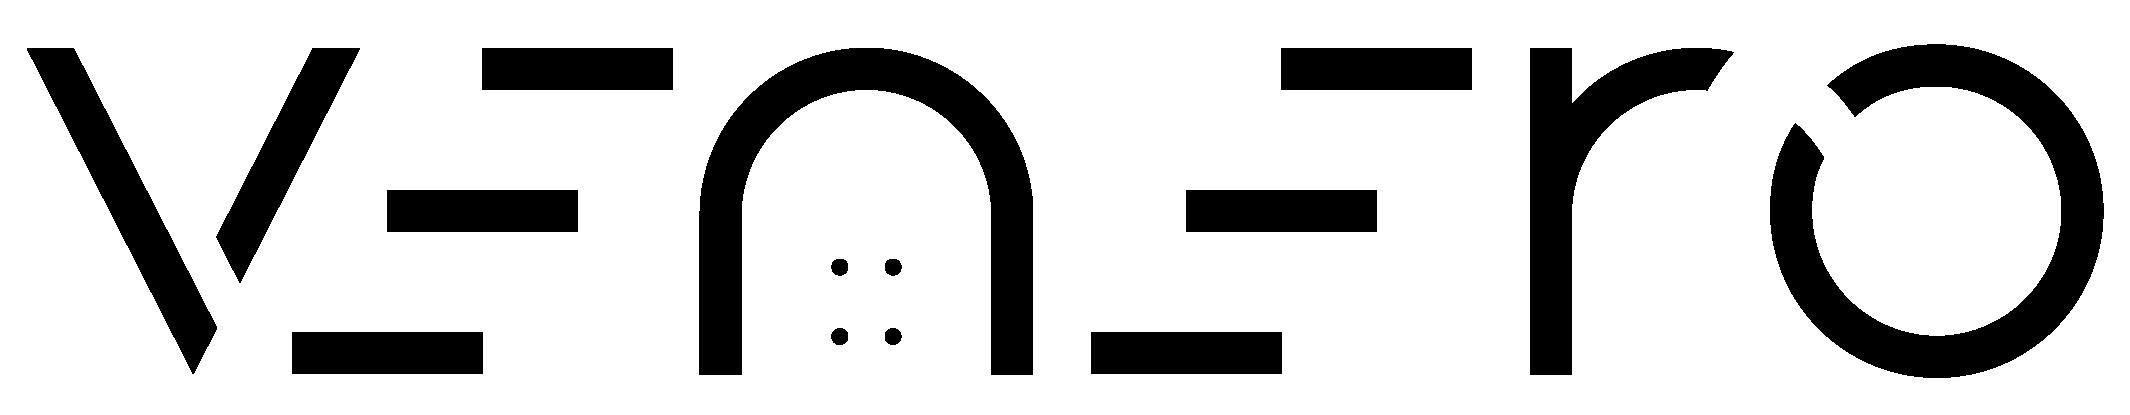 Venero